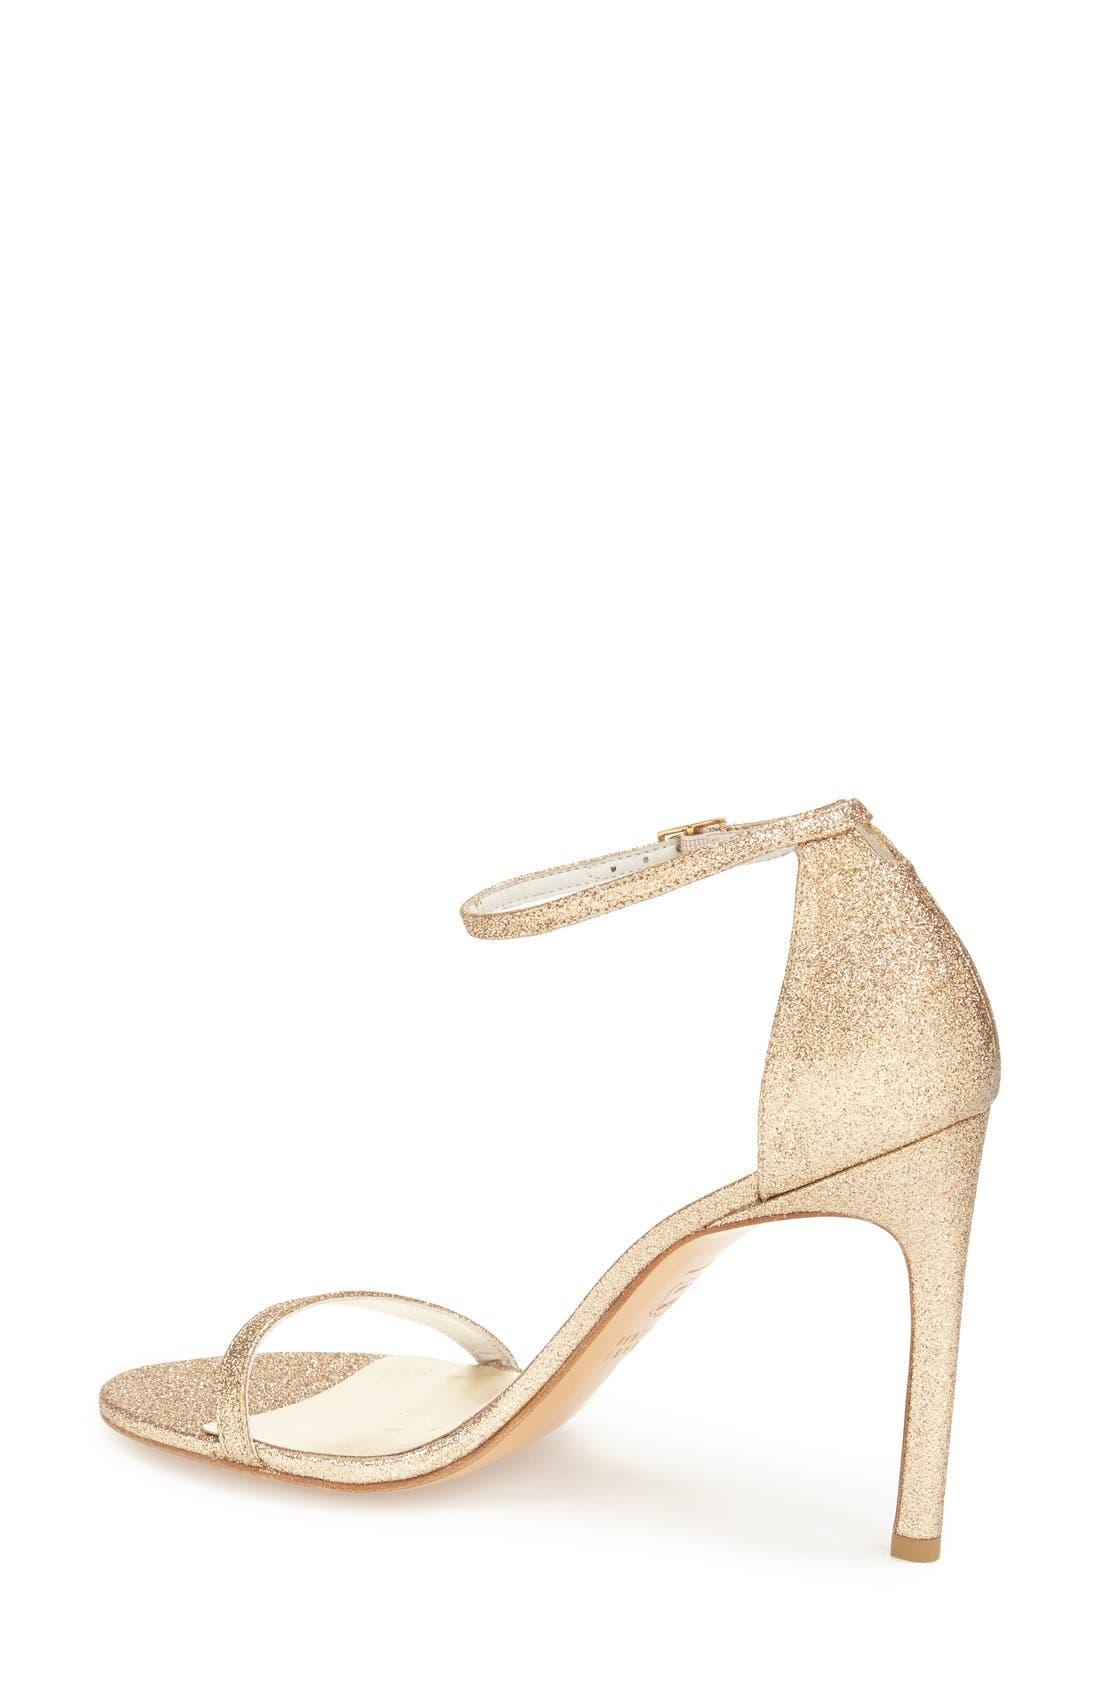 Nudistsong Ankle Strap Sandal,                             Alternate thumbnail 85, color,